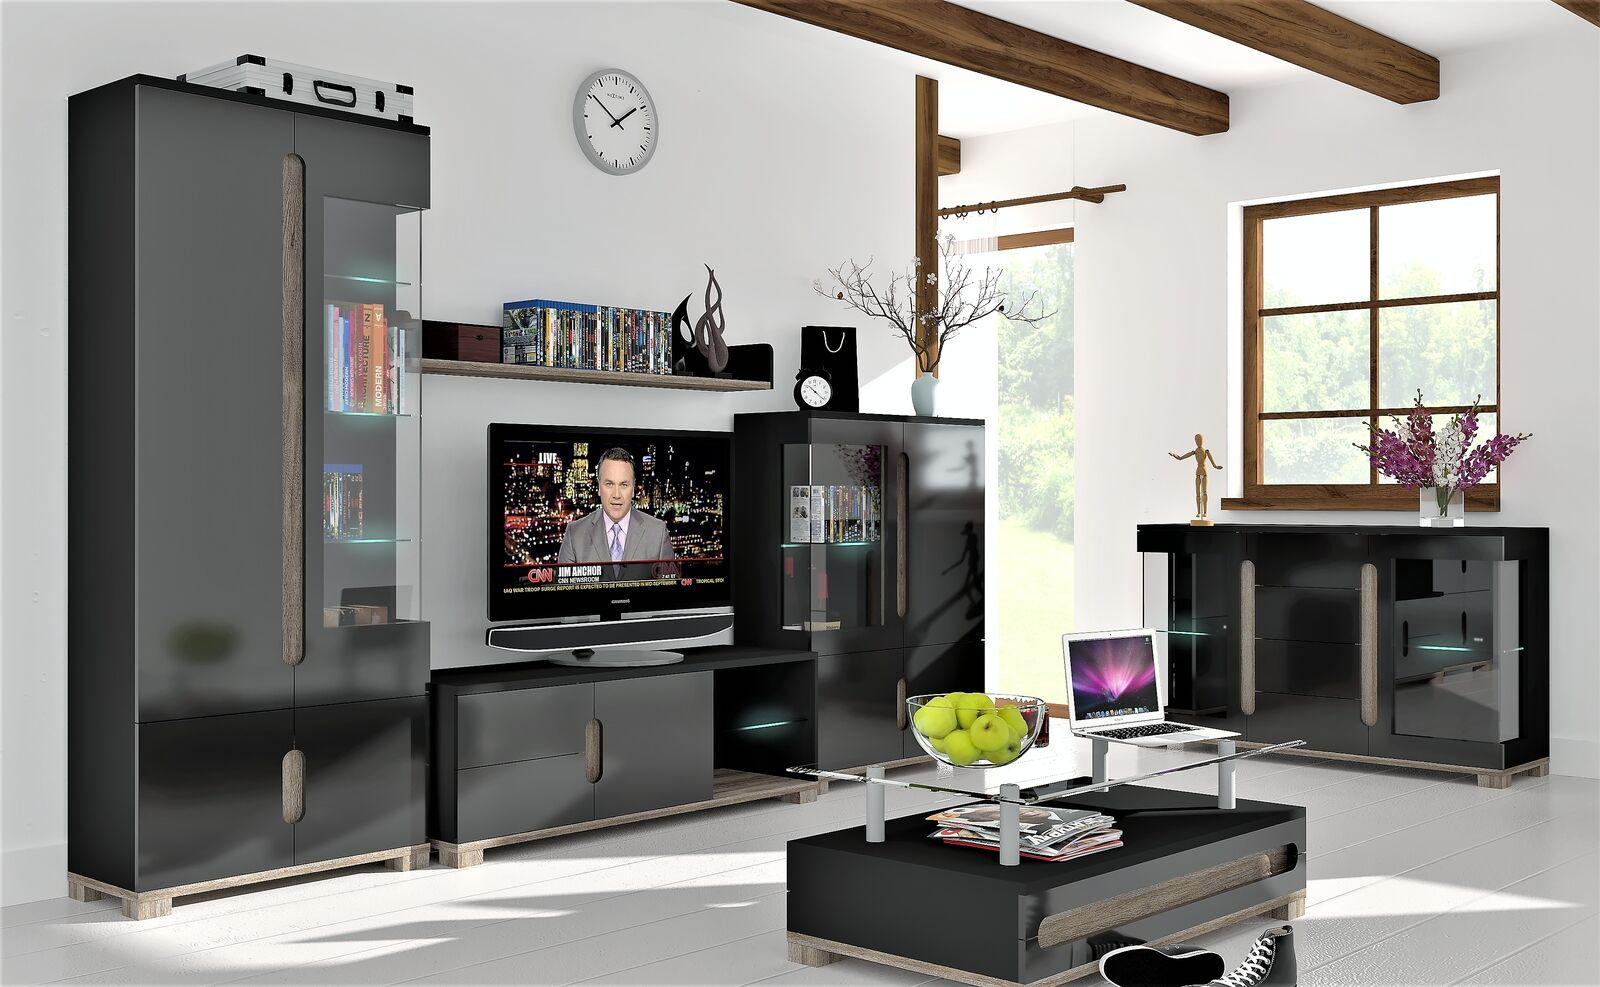 Lorenz Black Gloss Sideboard Tv Cabinet Display Unit Coffee Table Furniture